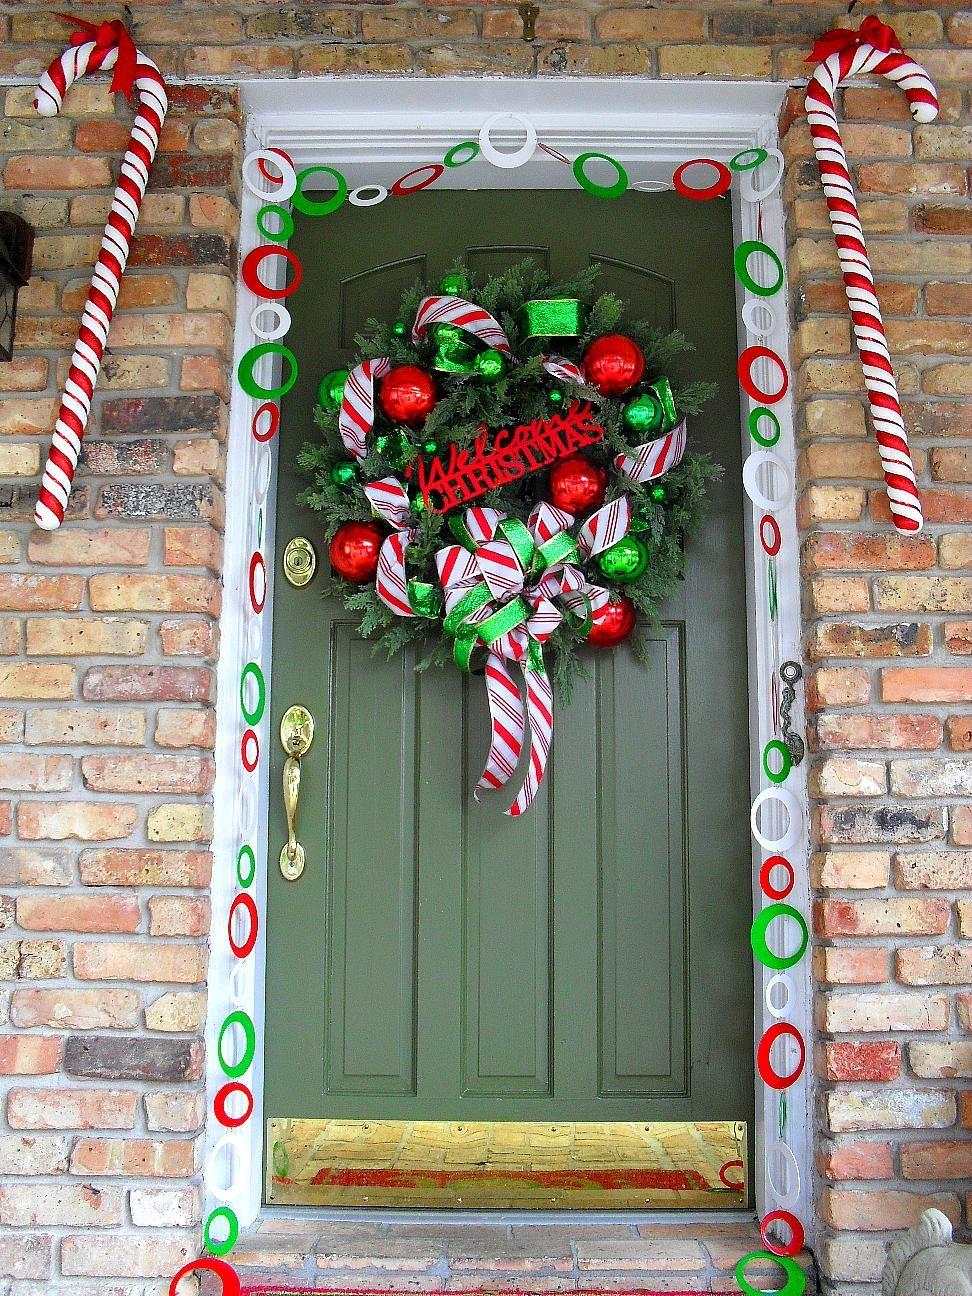 Welcome To Candy Cane Lane Christmas Door Decor Idea | CHRISTMAS ...